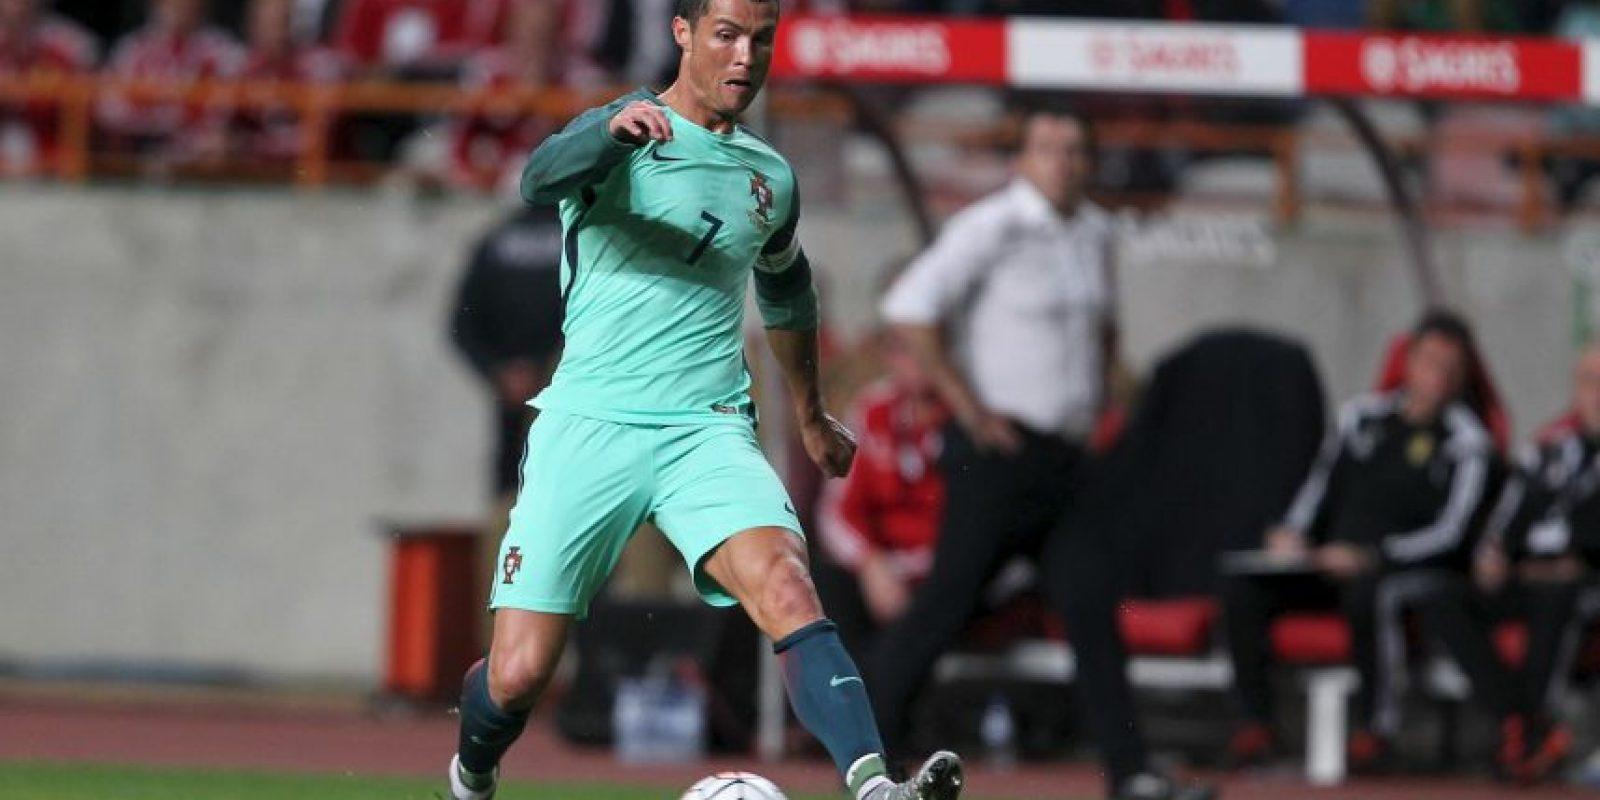 La gran esperanza de Portugal recae en Cristiano Ronaldo Foto:Getty Images